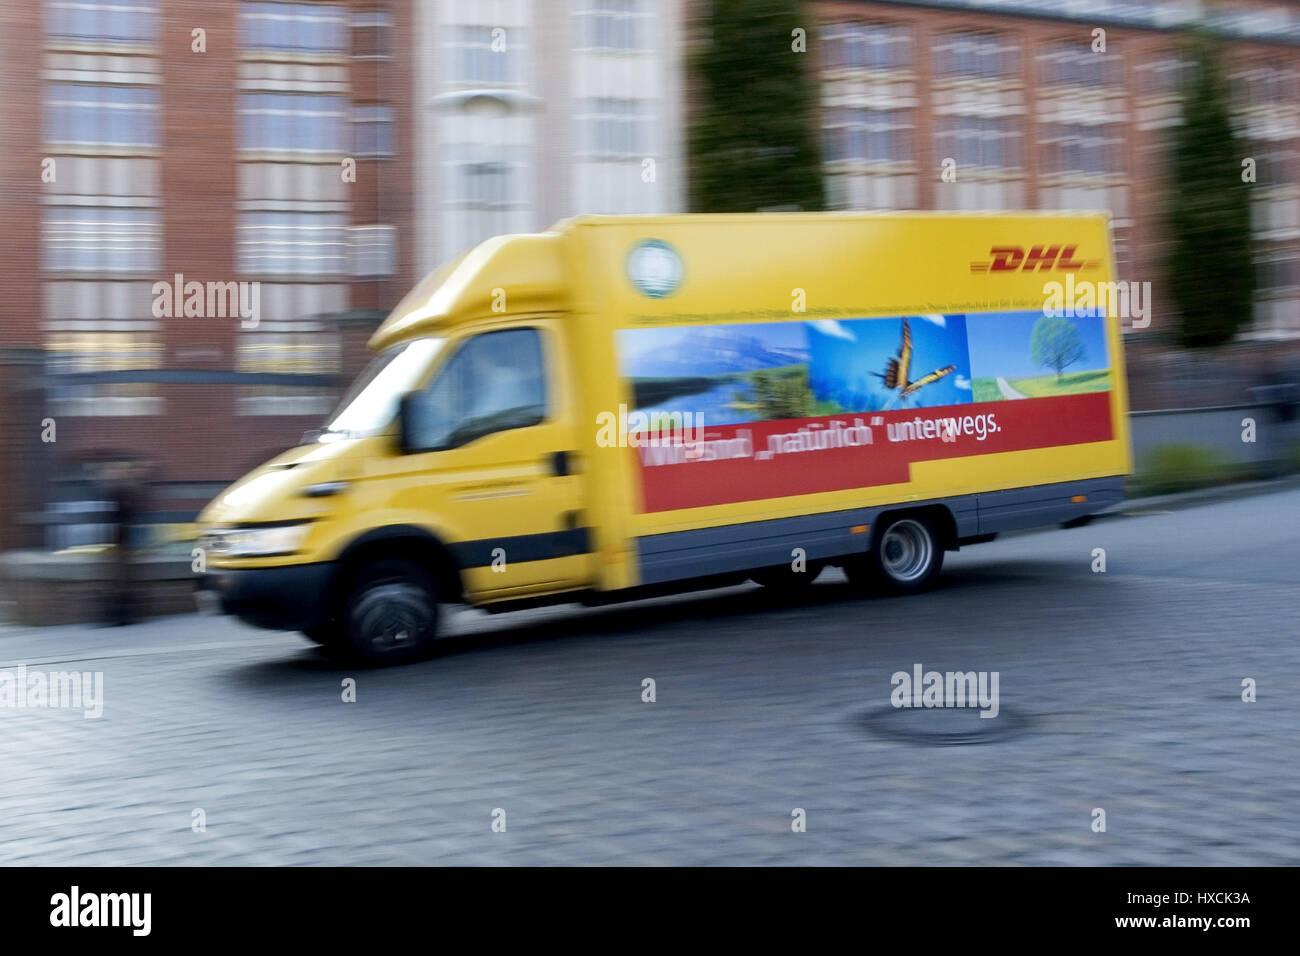 DHL delivery vans, DHL Lieferwagen Stock Photo